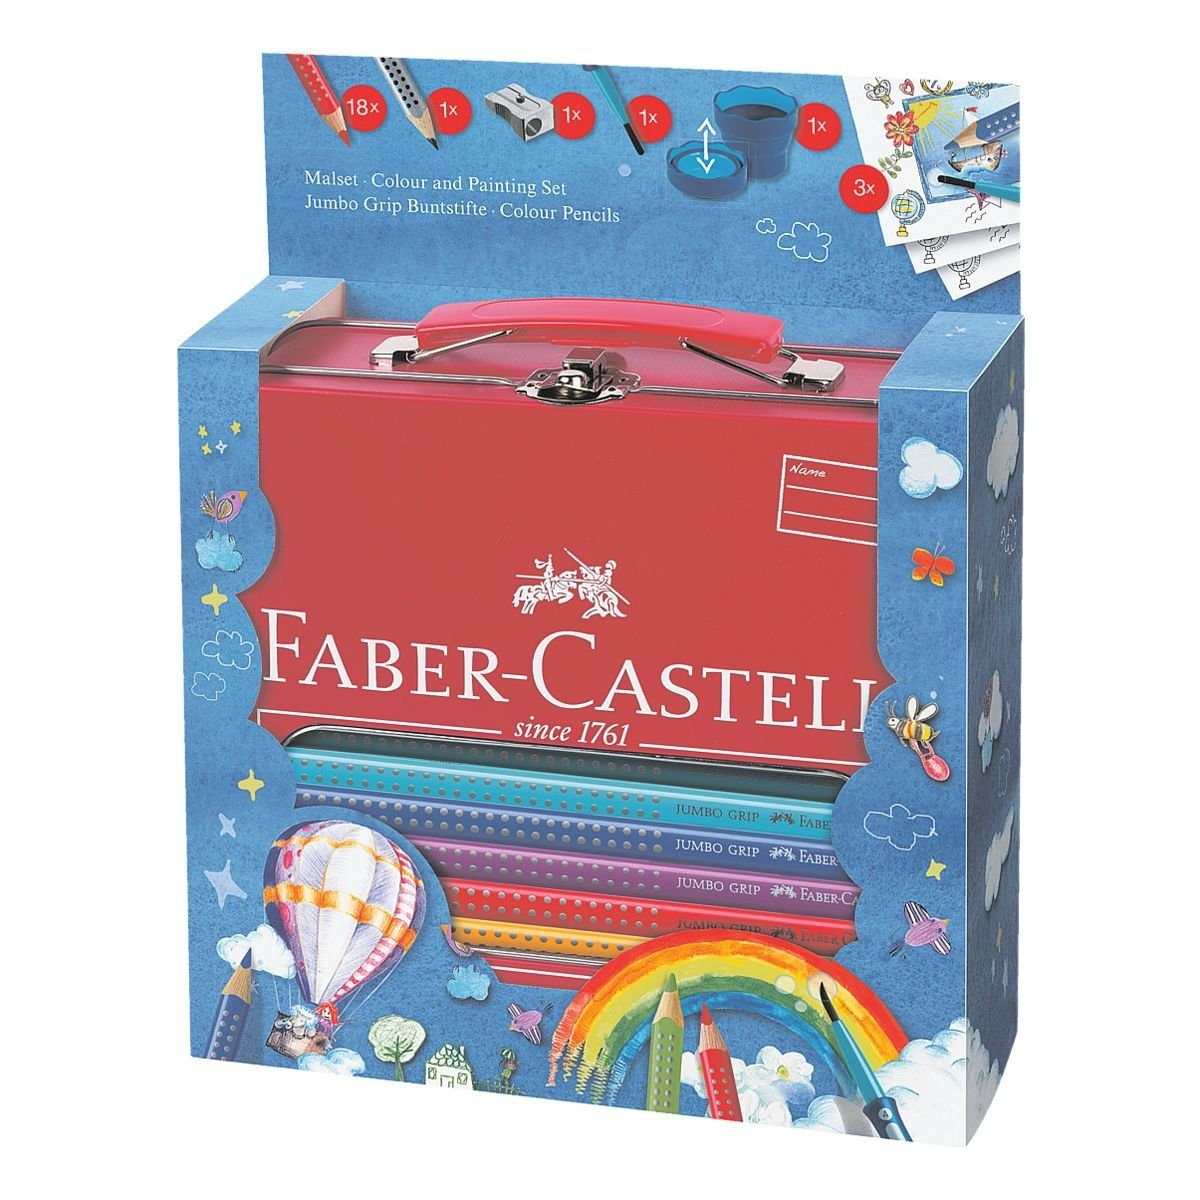 Faber-Castell Malset-Box »Jumbo GRIP«